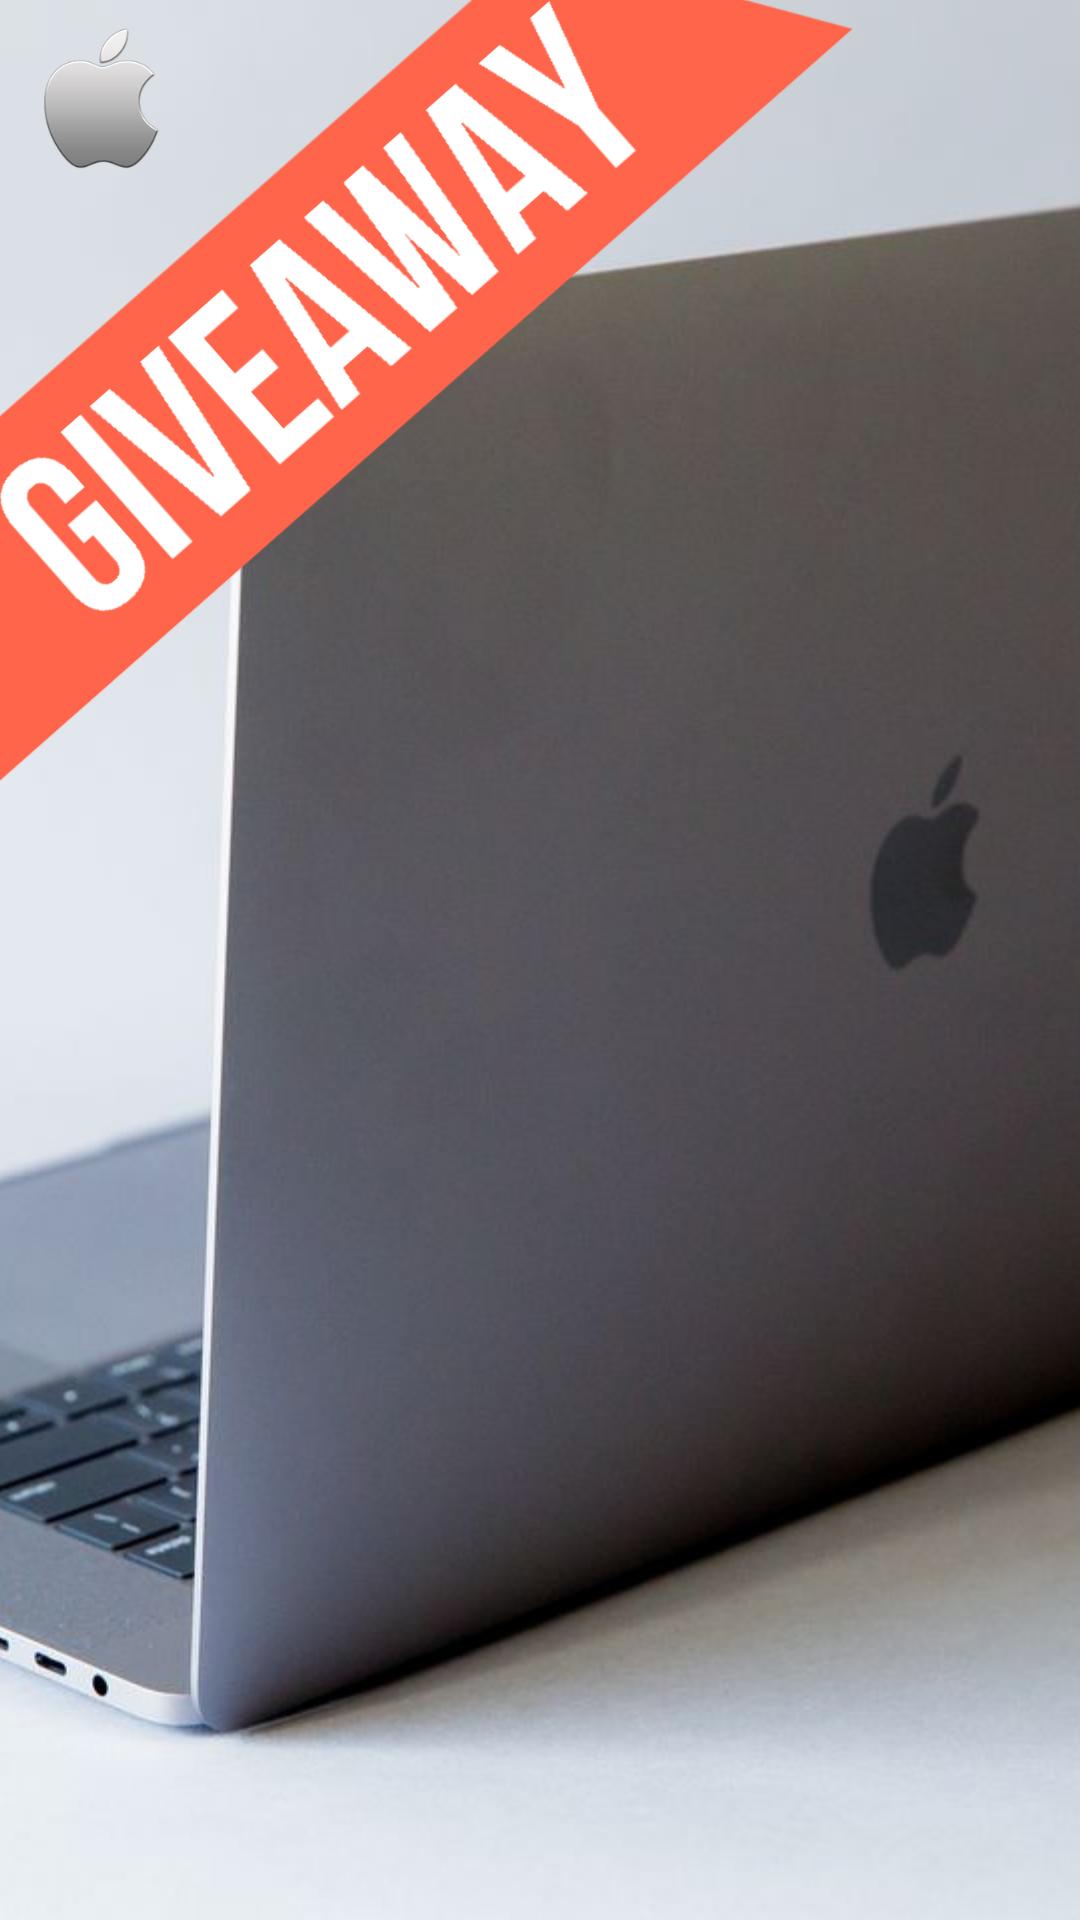 Free macbook pro giveaway